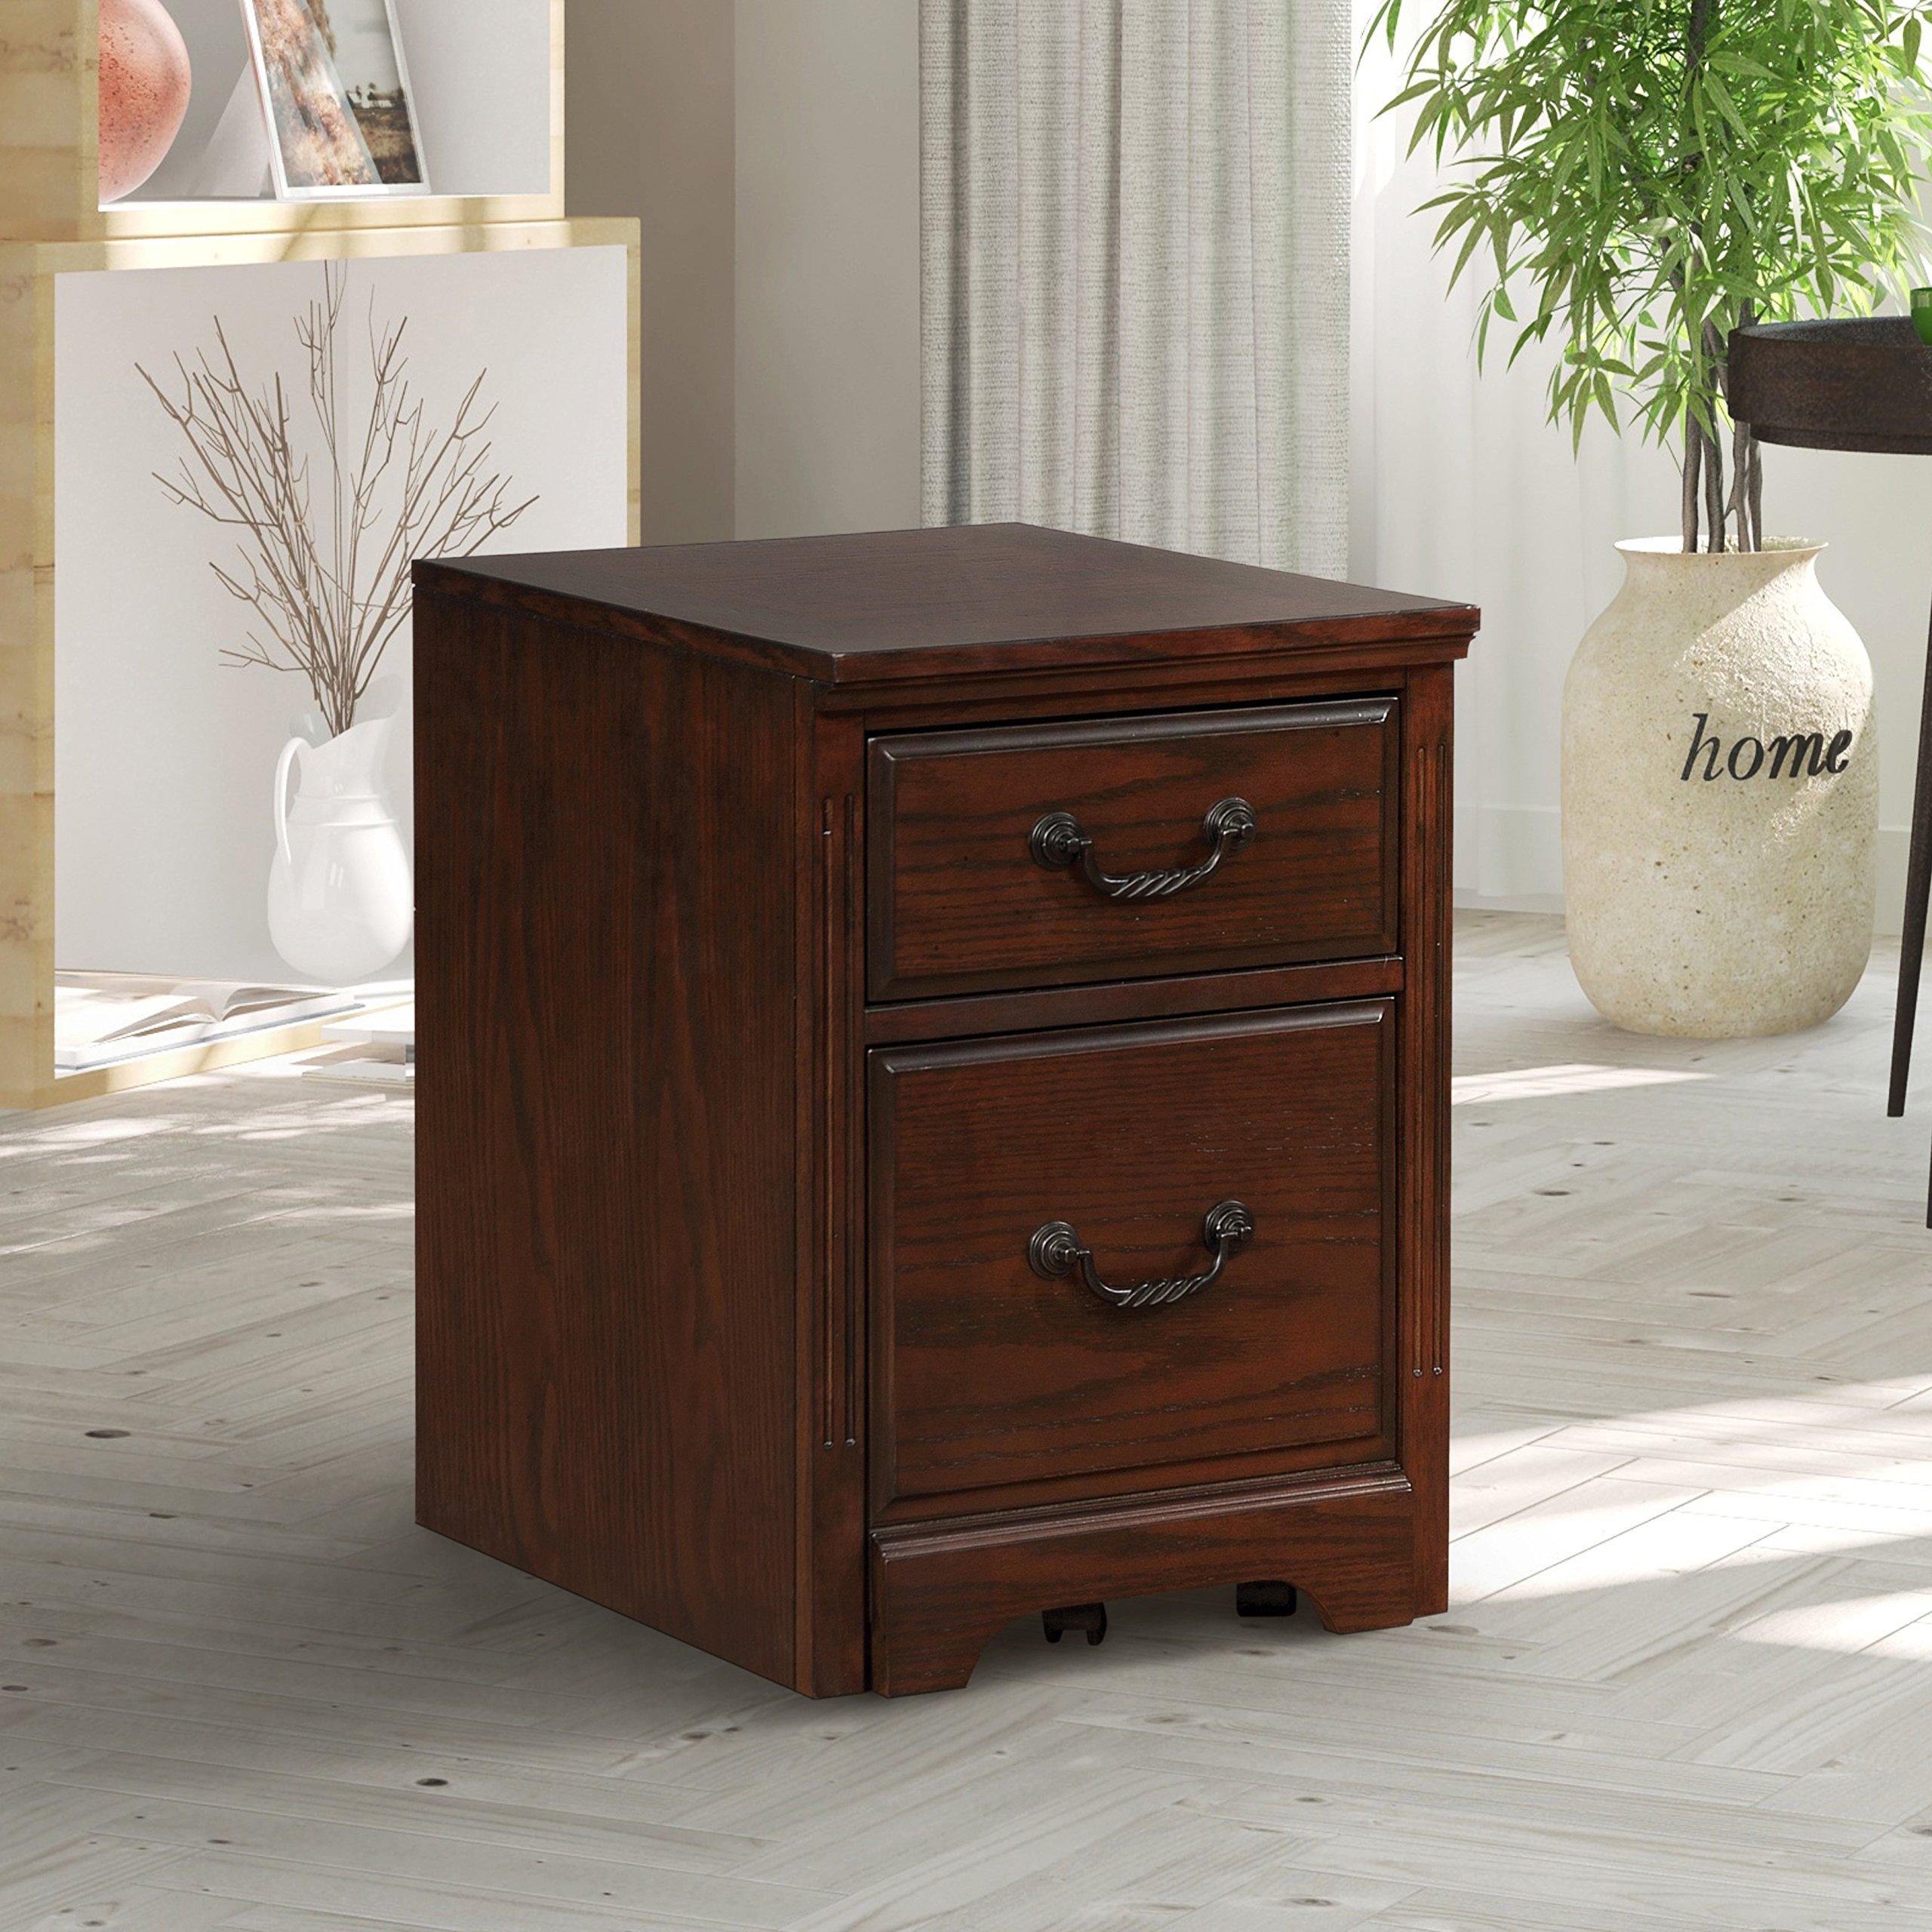 Furniture of America Devon Traditional 2-drawer Caster Dark Walnut Cabinet by Furniture of America